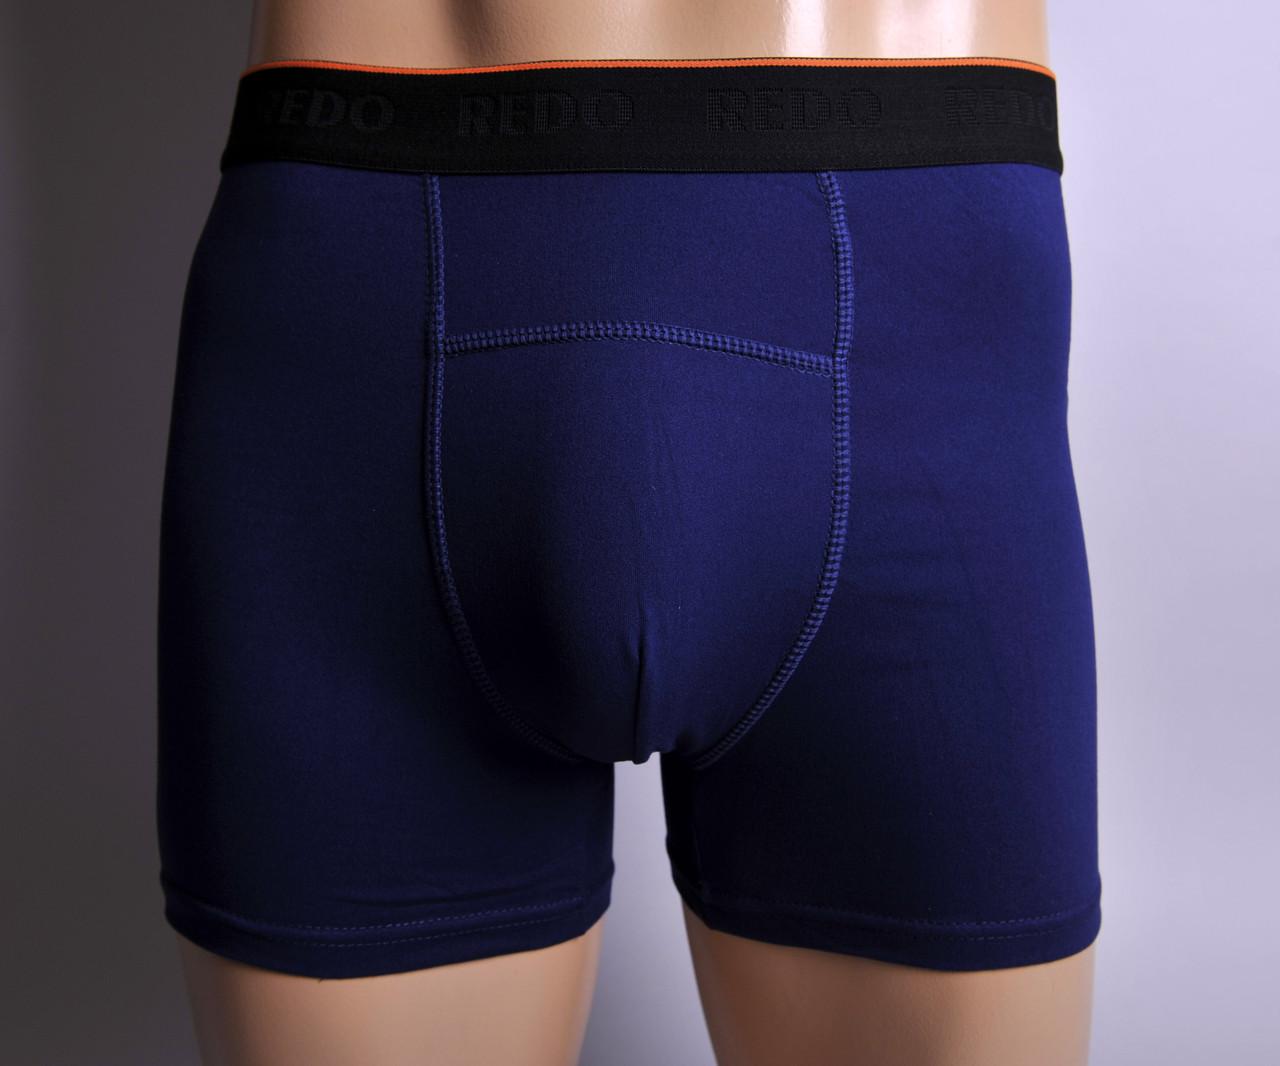 Мужские трусы - боксеры Redo 1622 3XL синий